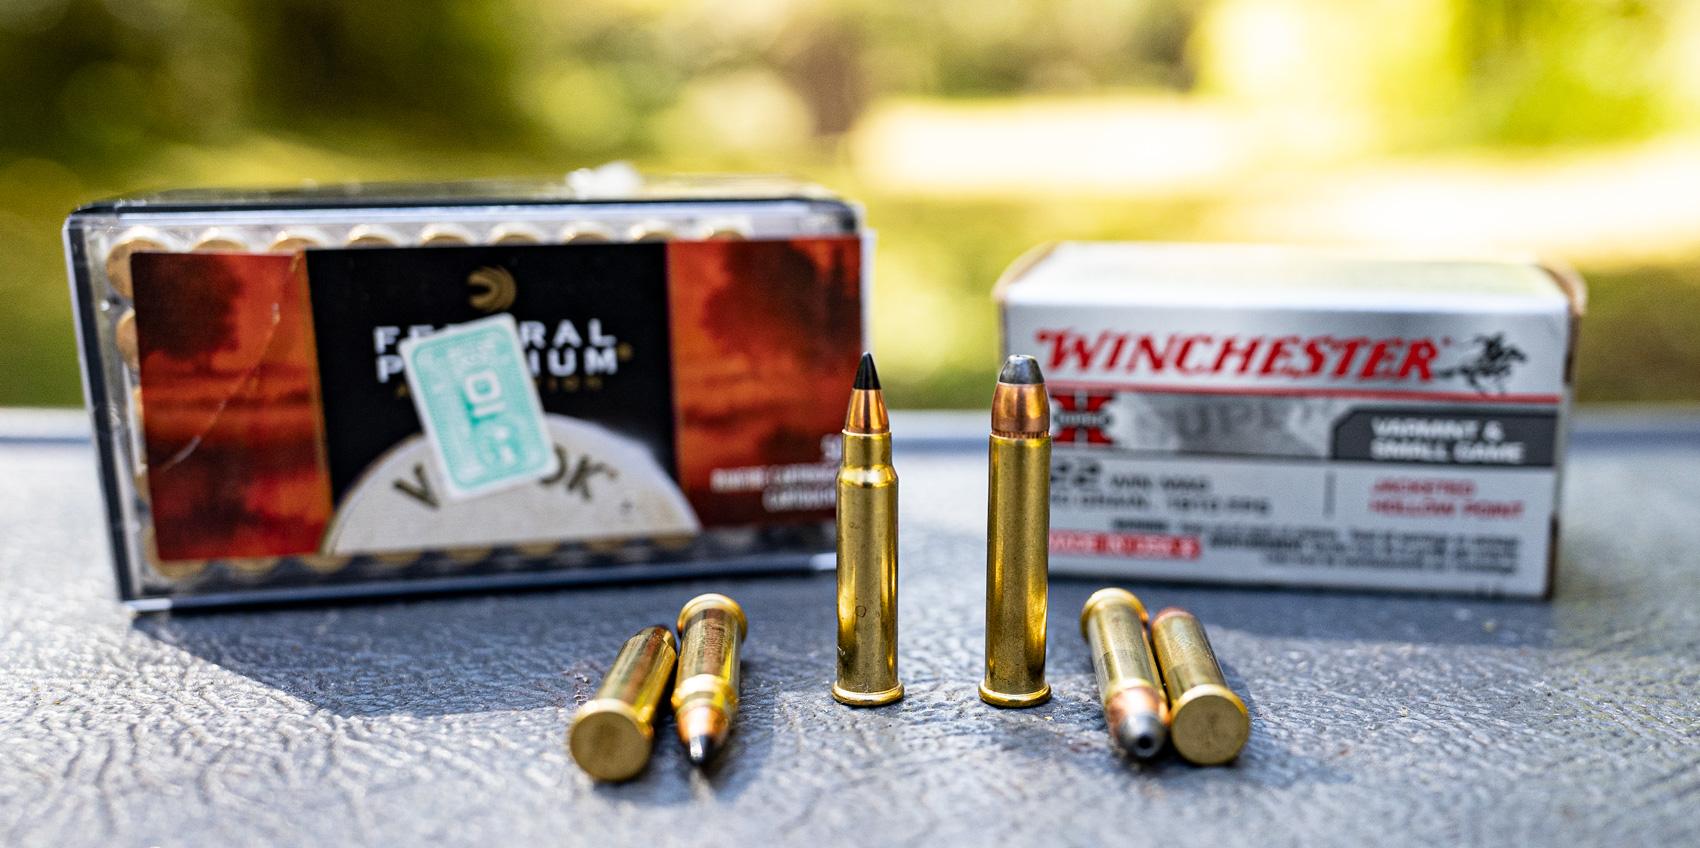 17 HMR ammo vs 22 WMR ammo on a shooting bench